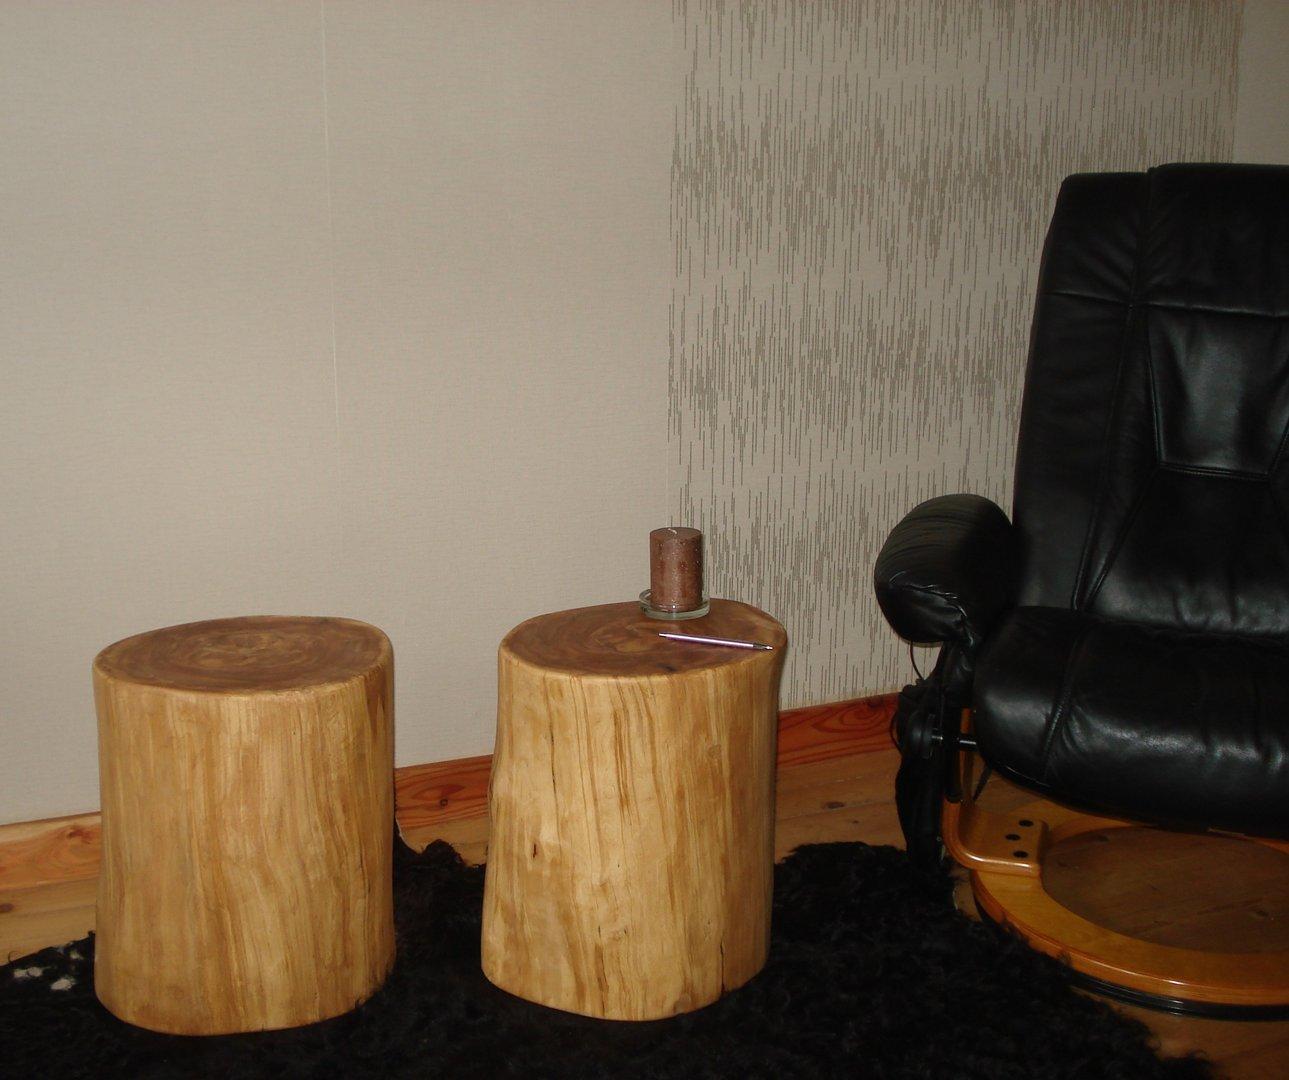 baumstamm kaufen. Black Bedroom Furniture Sets. Home Design Ideas